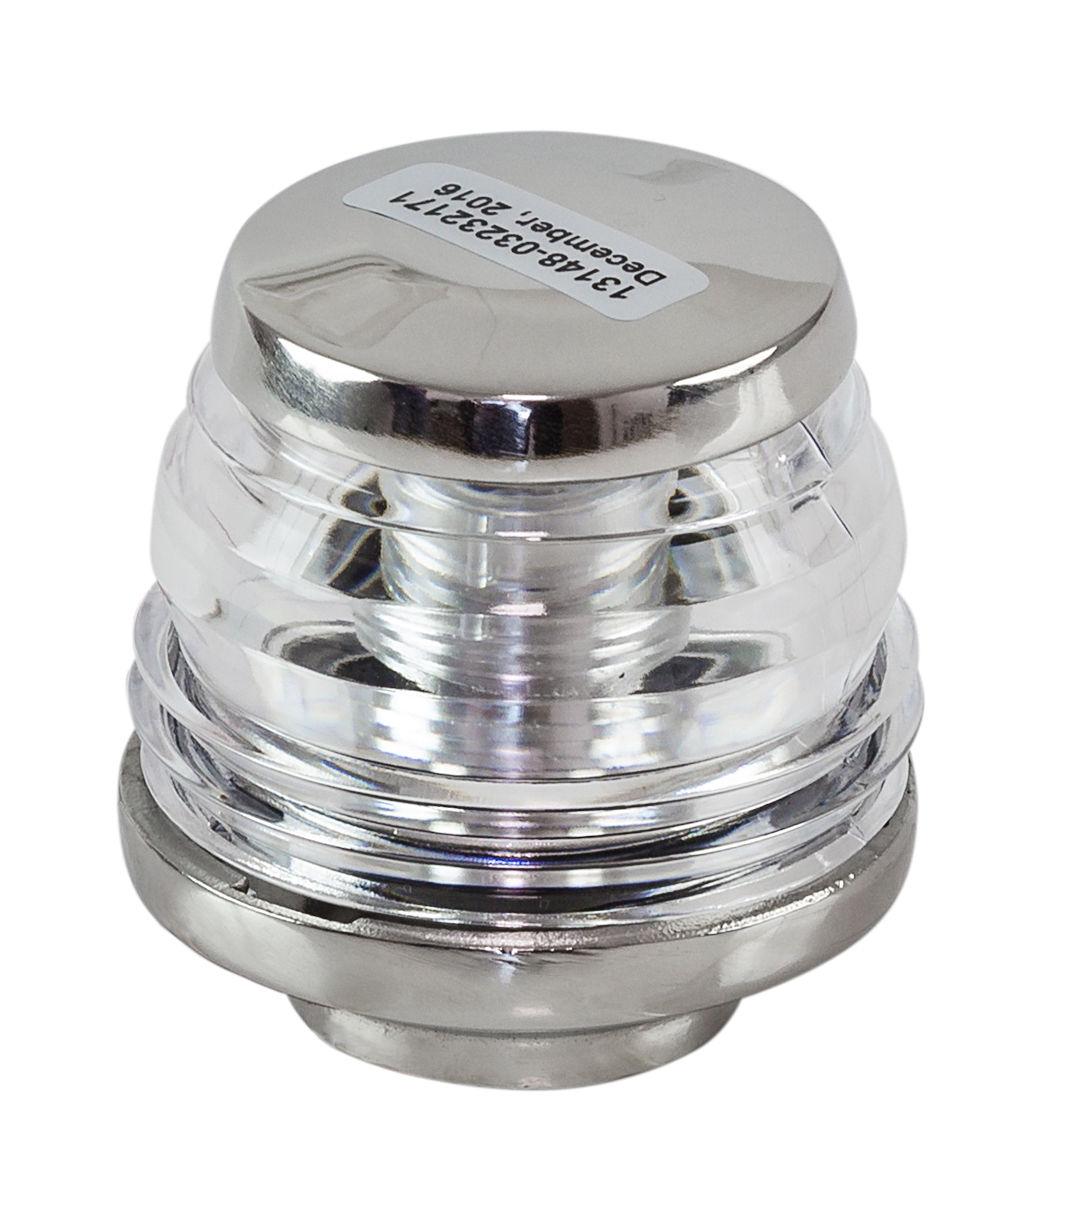 Fire Top Dia. 60x62mm, Stainless Steel Case, 12-24 V 2 W LED Ba15d LPNVGFL00379